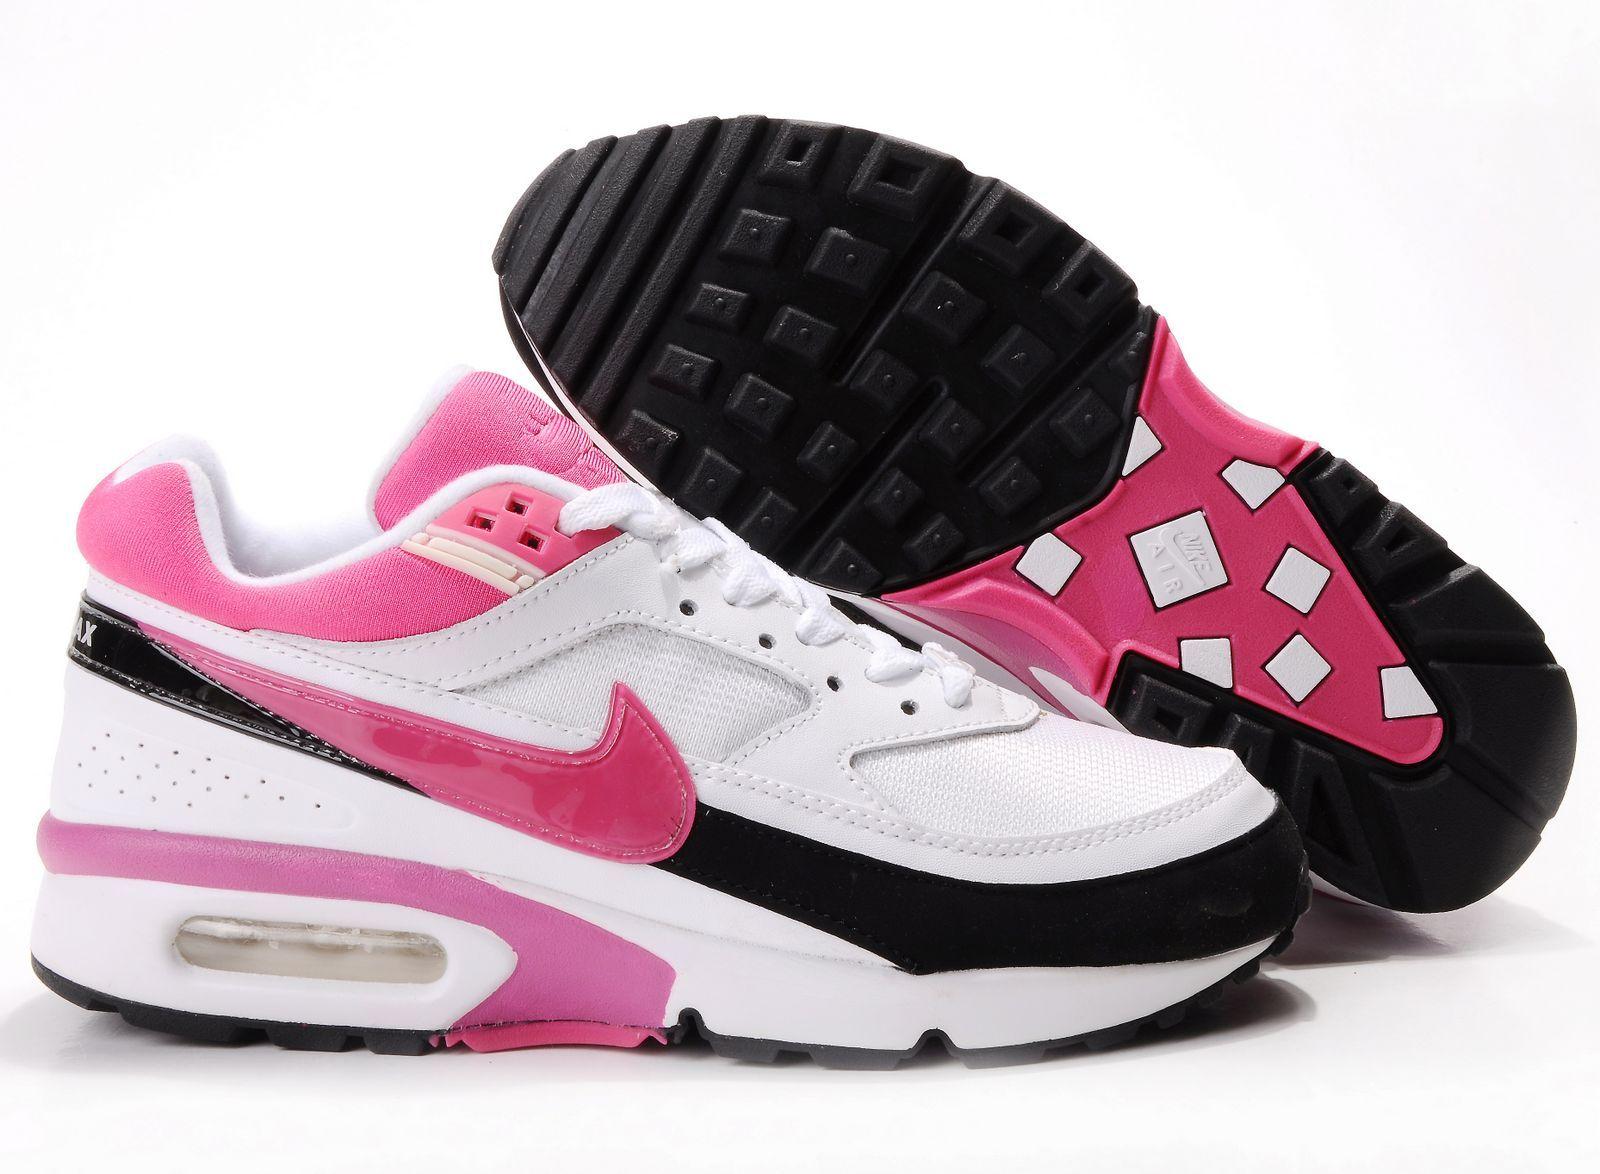 Nike Air Max Classic 91 BW Womens Shoes PinkWhiteGrey